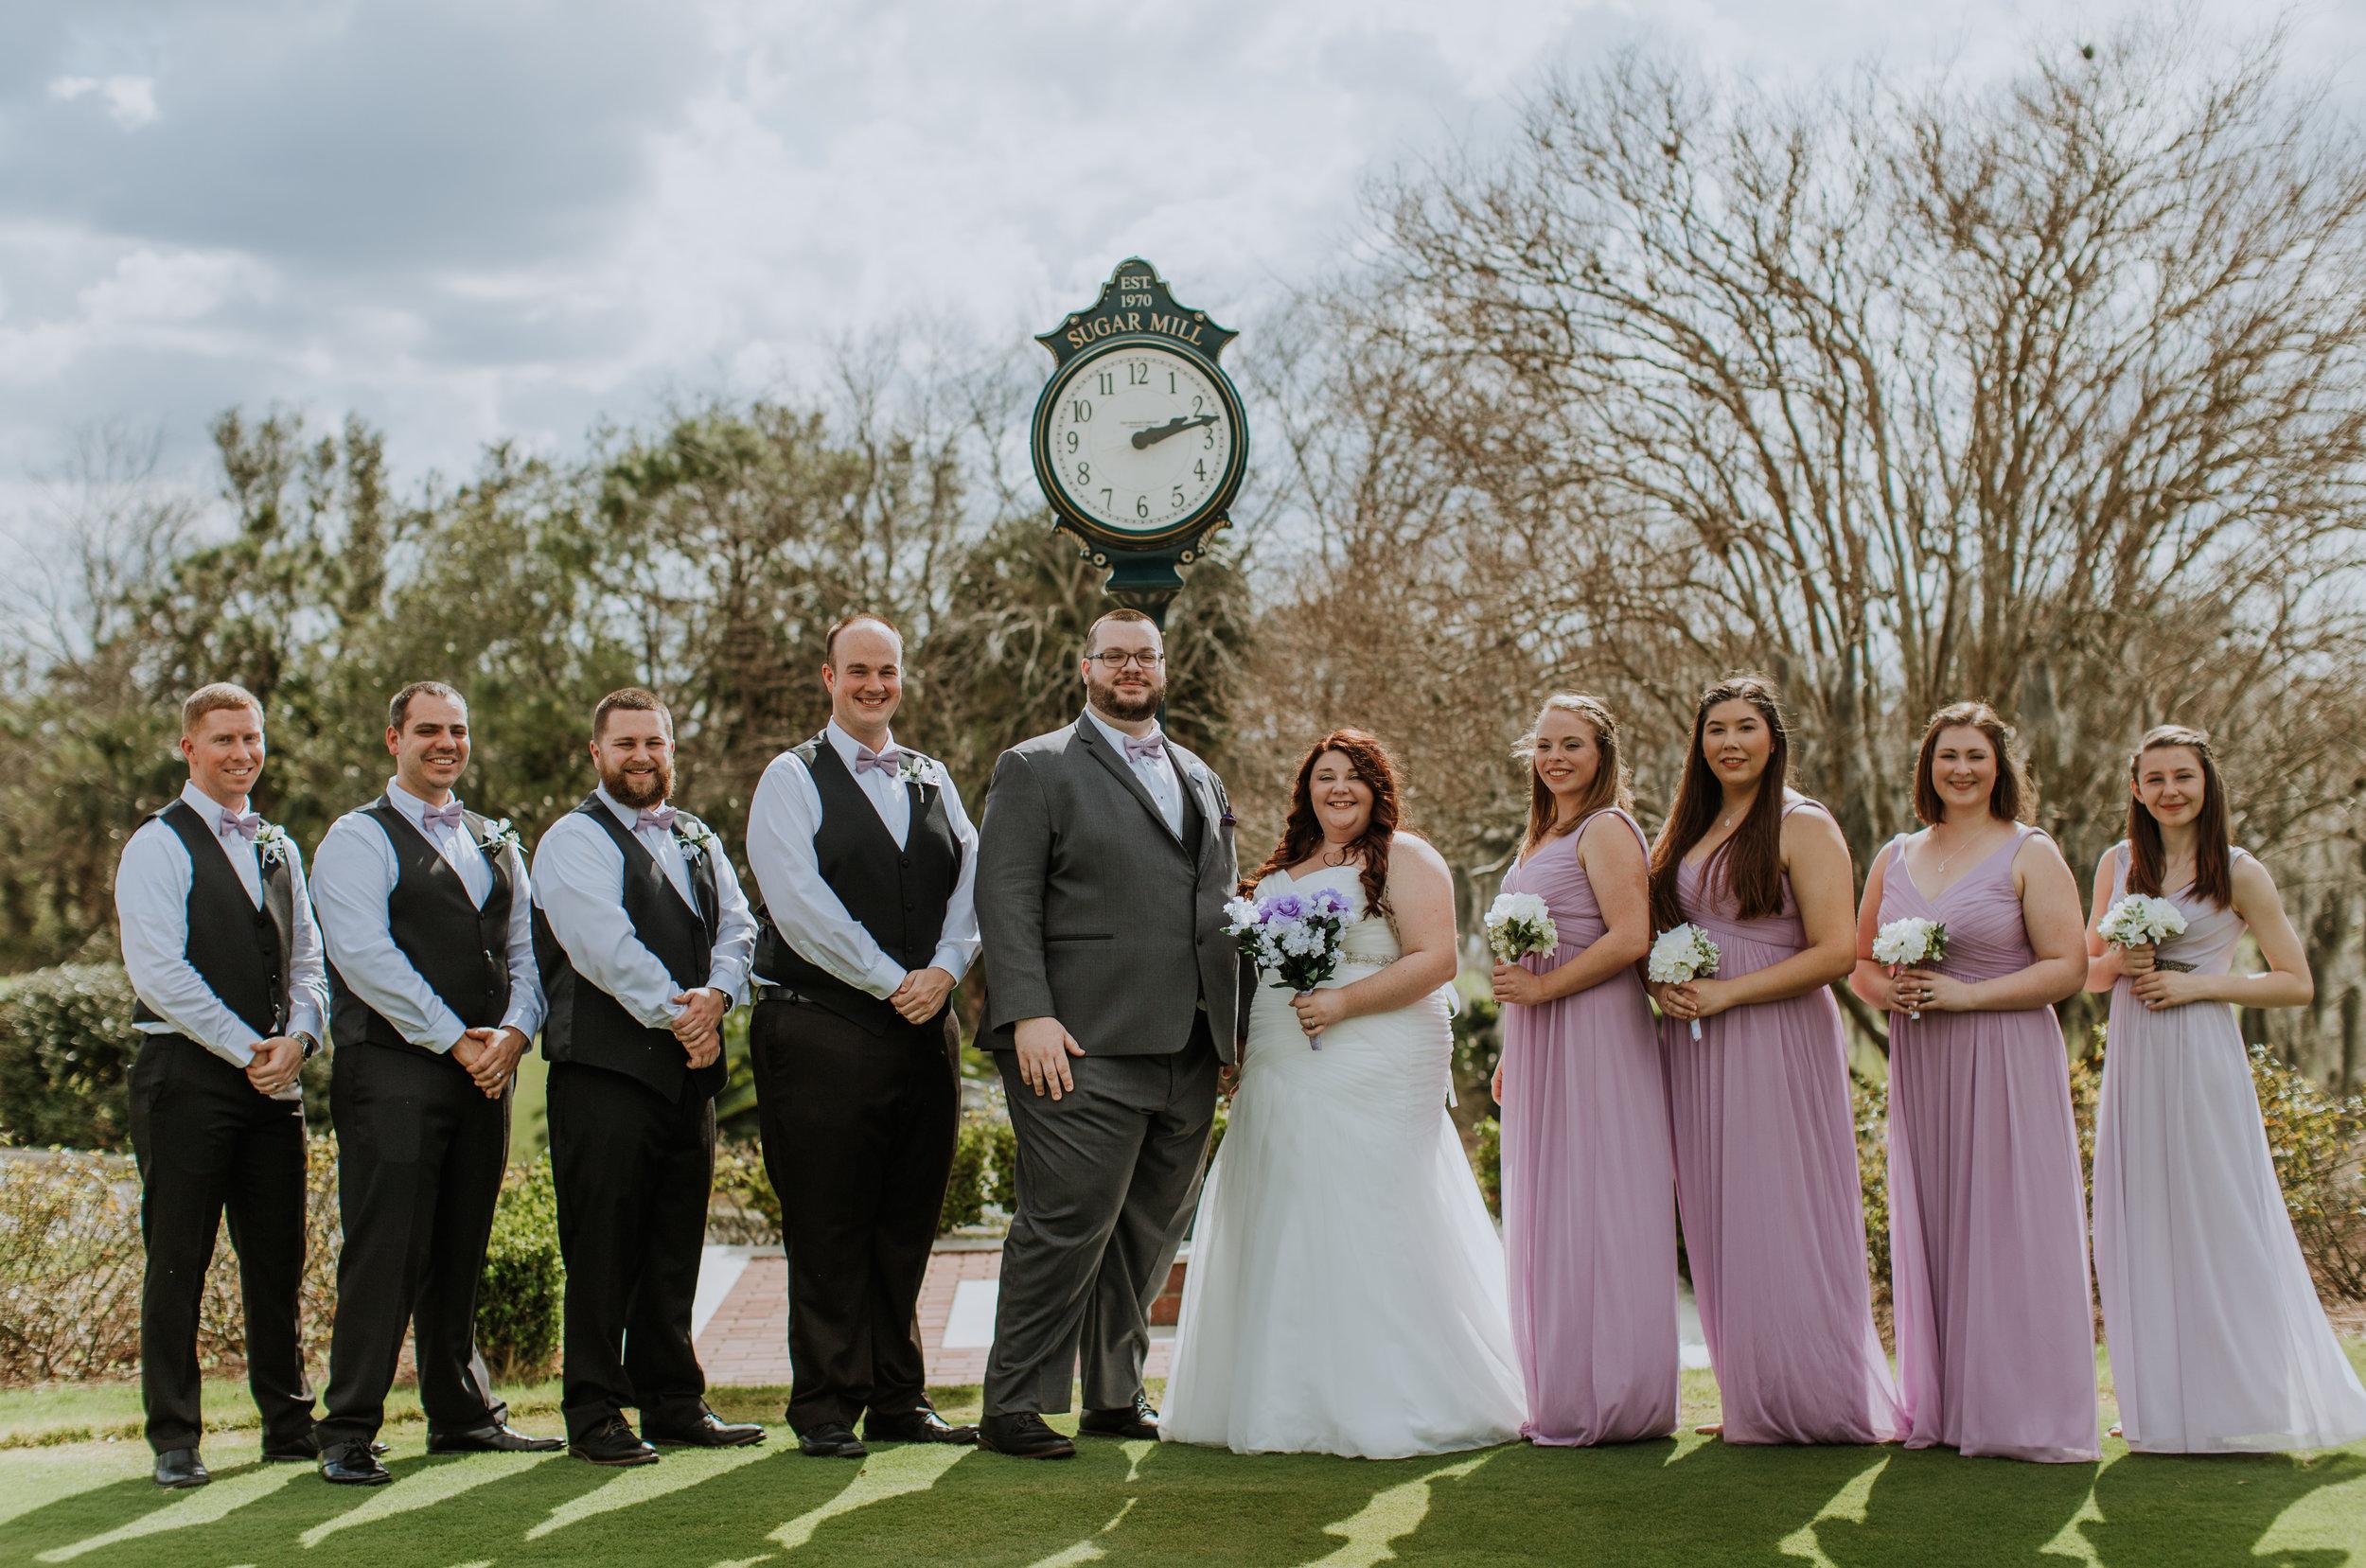 appolloni_new smyrna_wedding-302.jpg